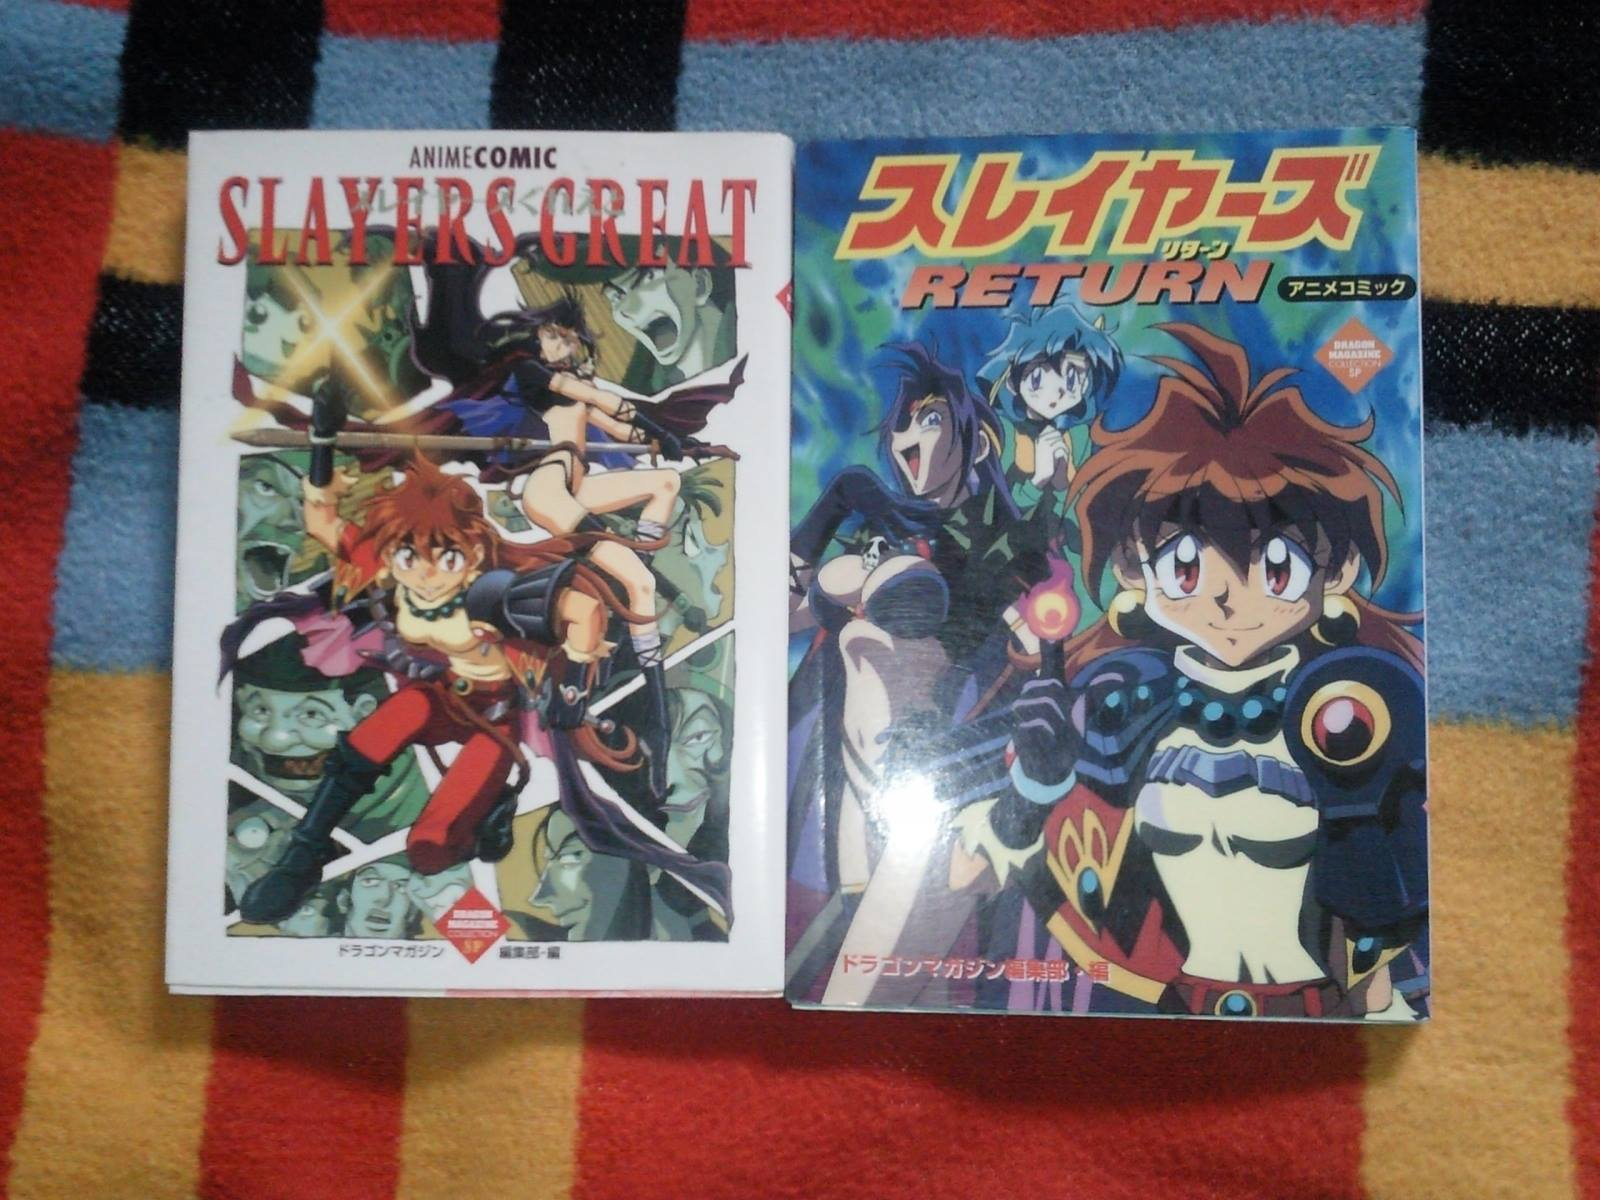 fujimi_shobou anime_comics slayers_return slayers_great